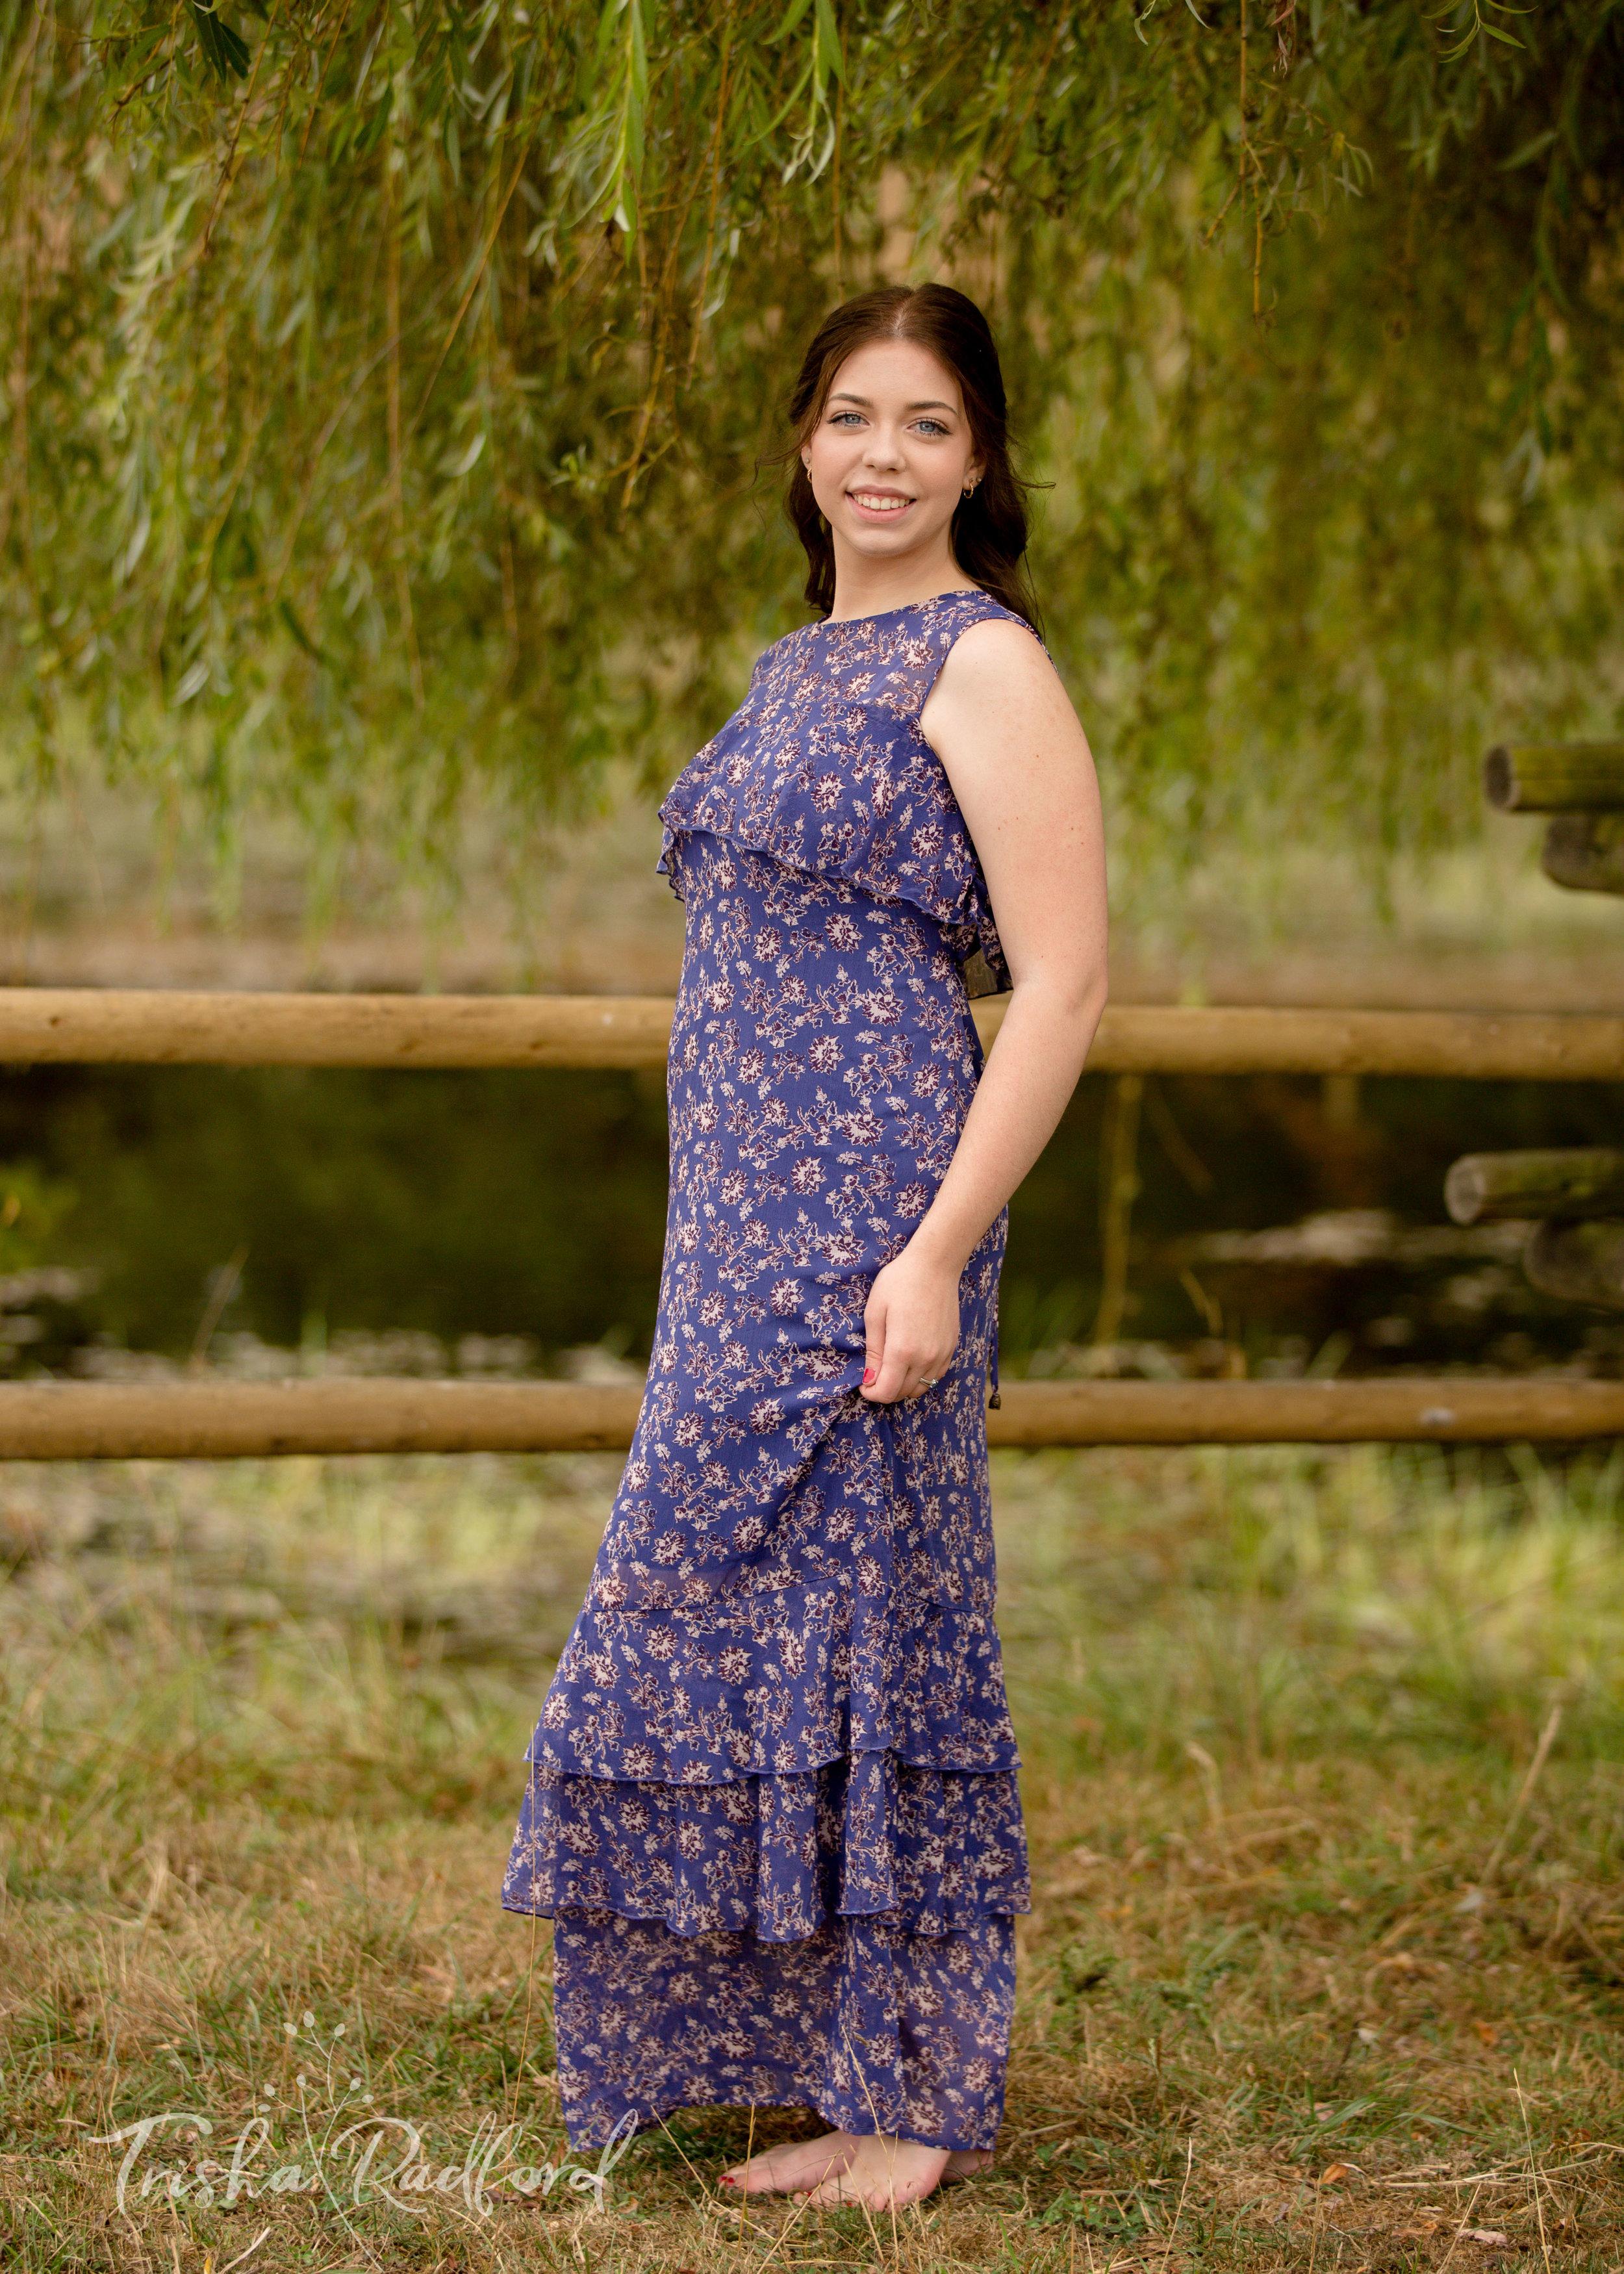 Senior Portrait Photographer Snohomish County | Arlington, WA